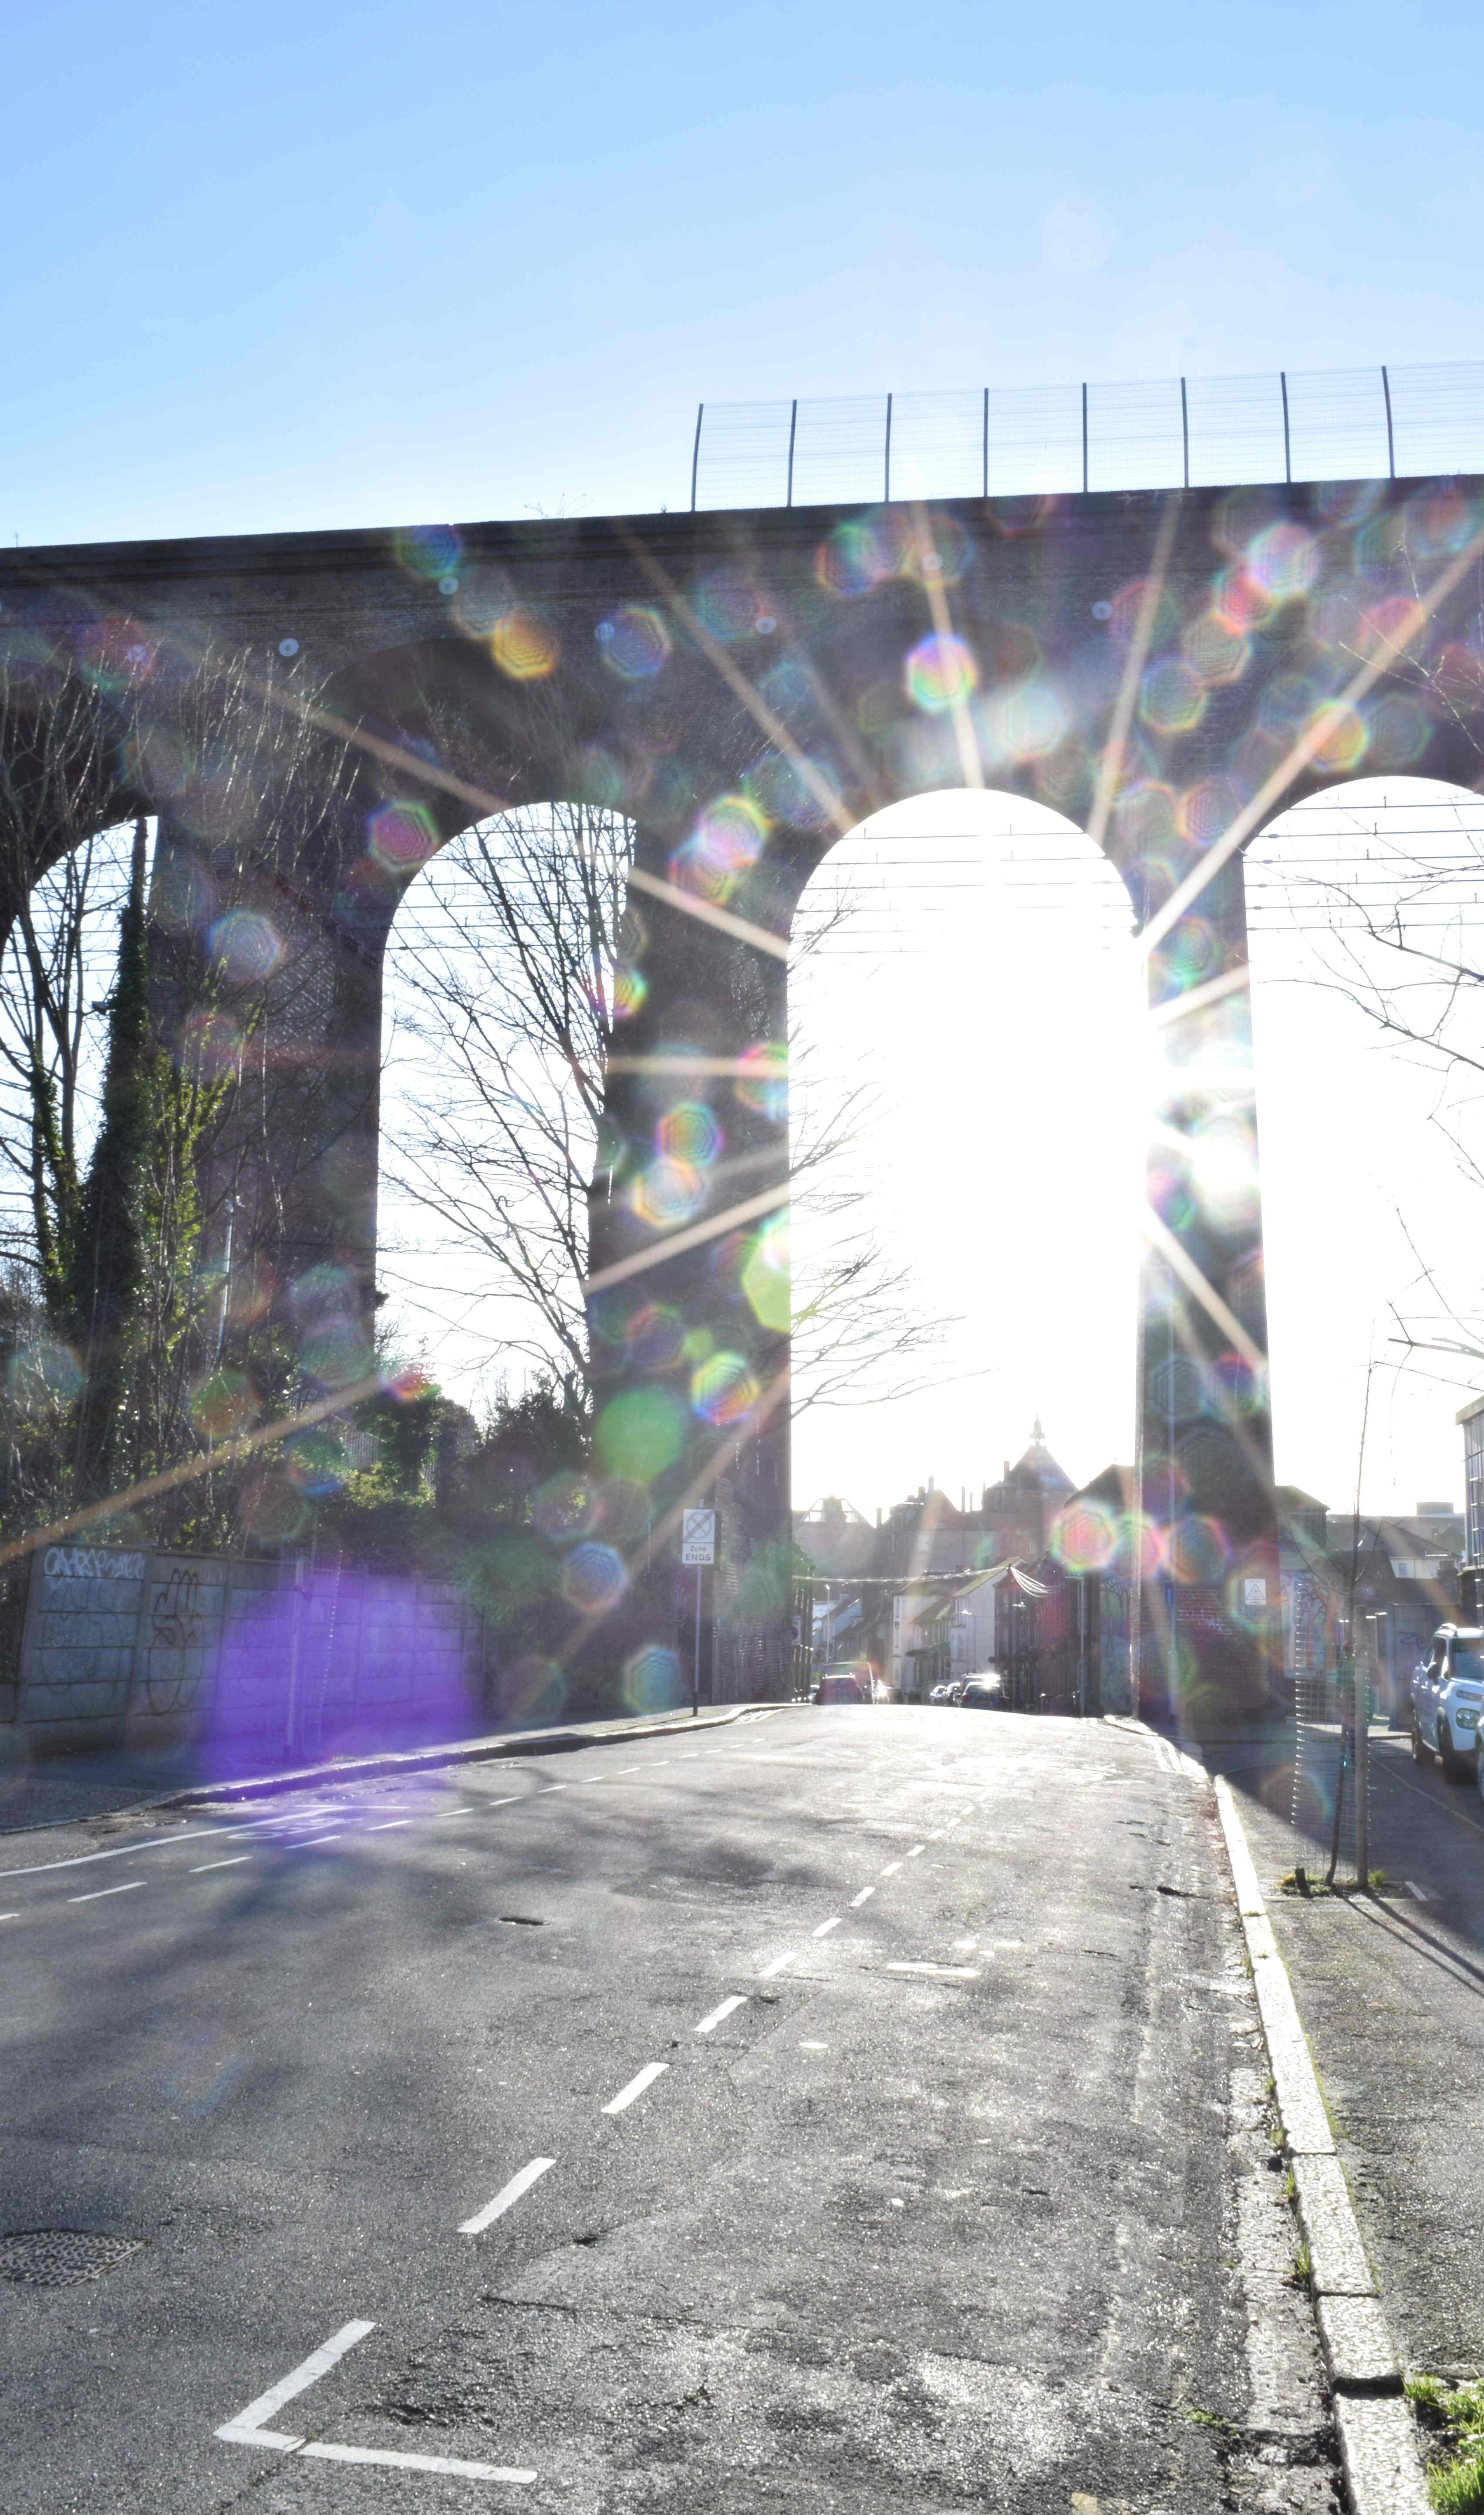 Sunlight through the viaduct